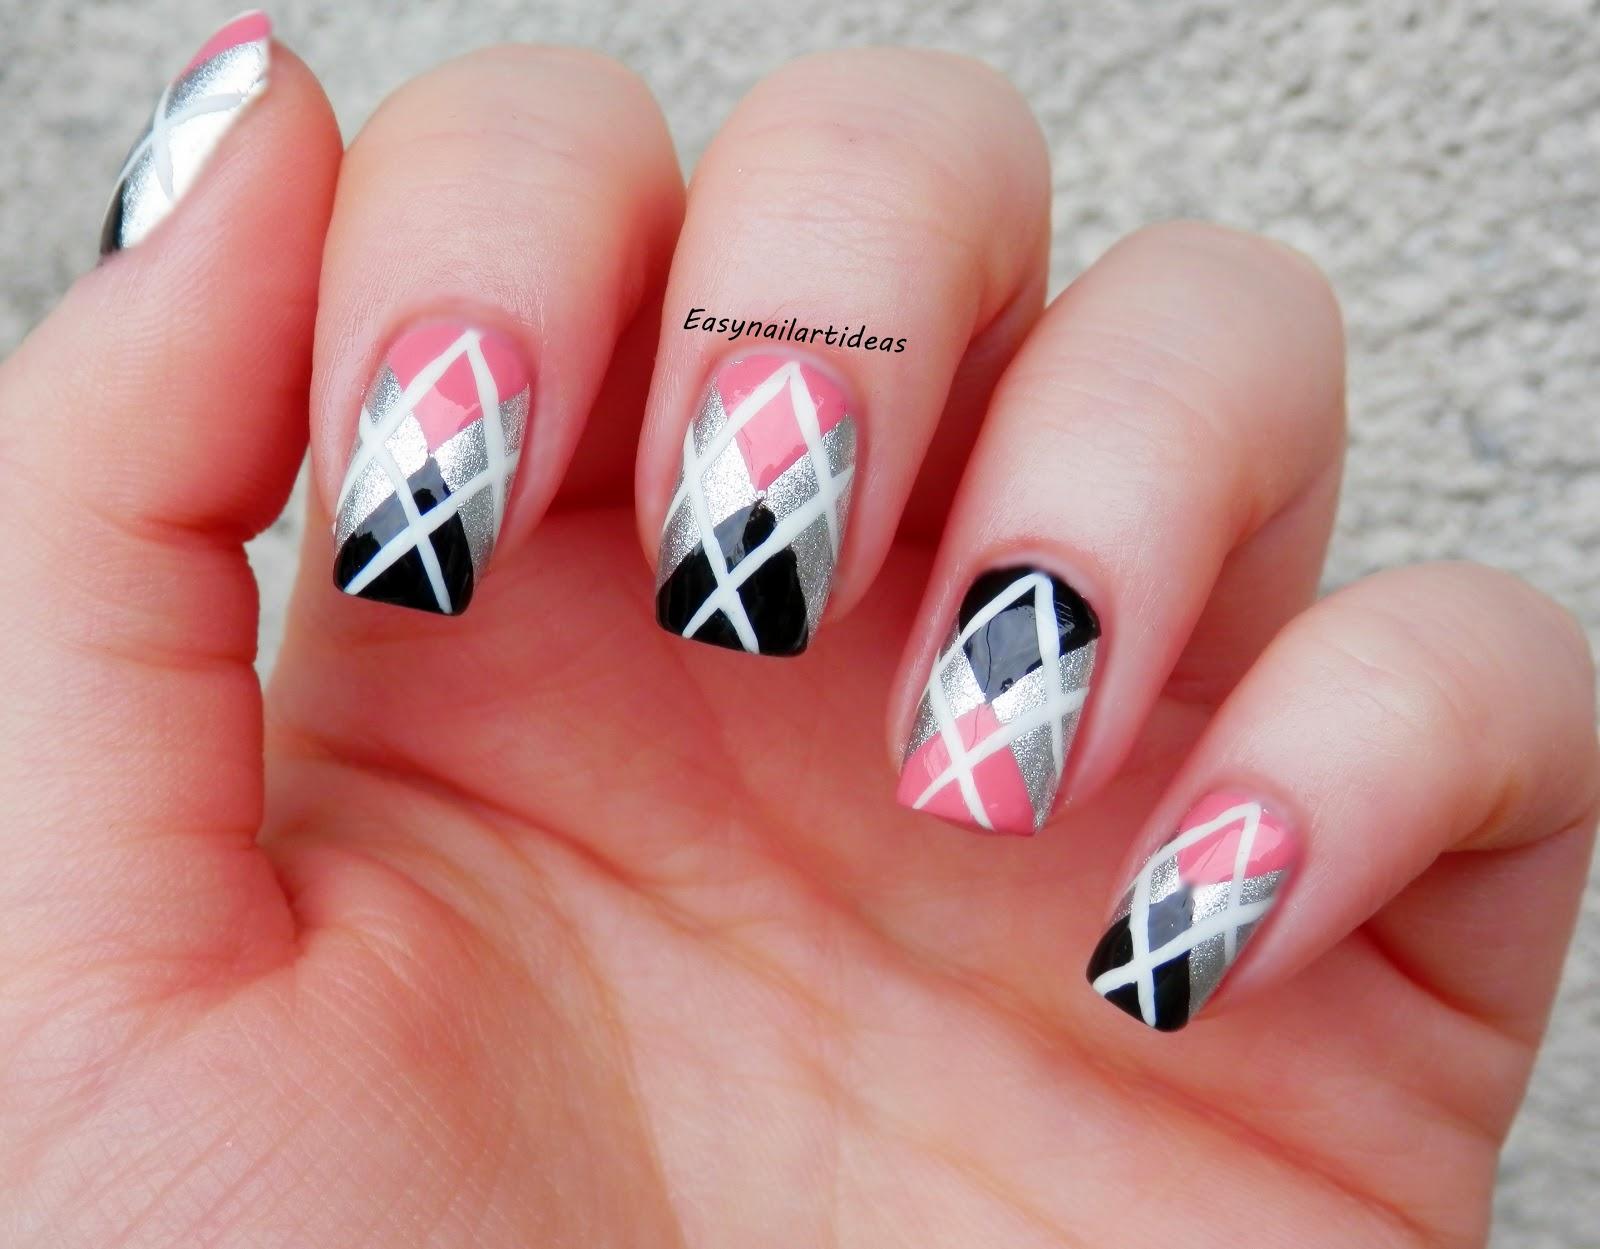 EASY NAIL ART and make-up IDEAS: Back to school nail art ...